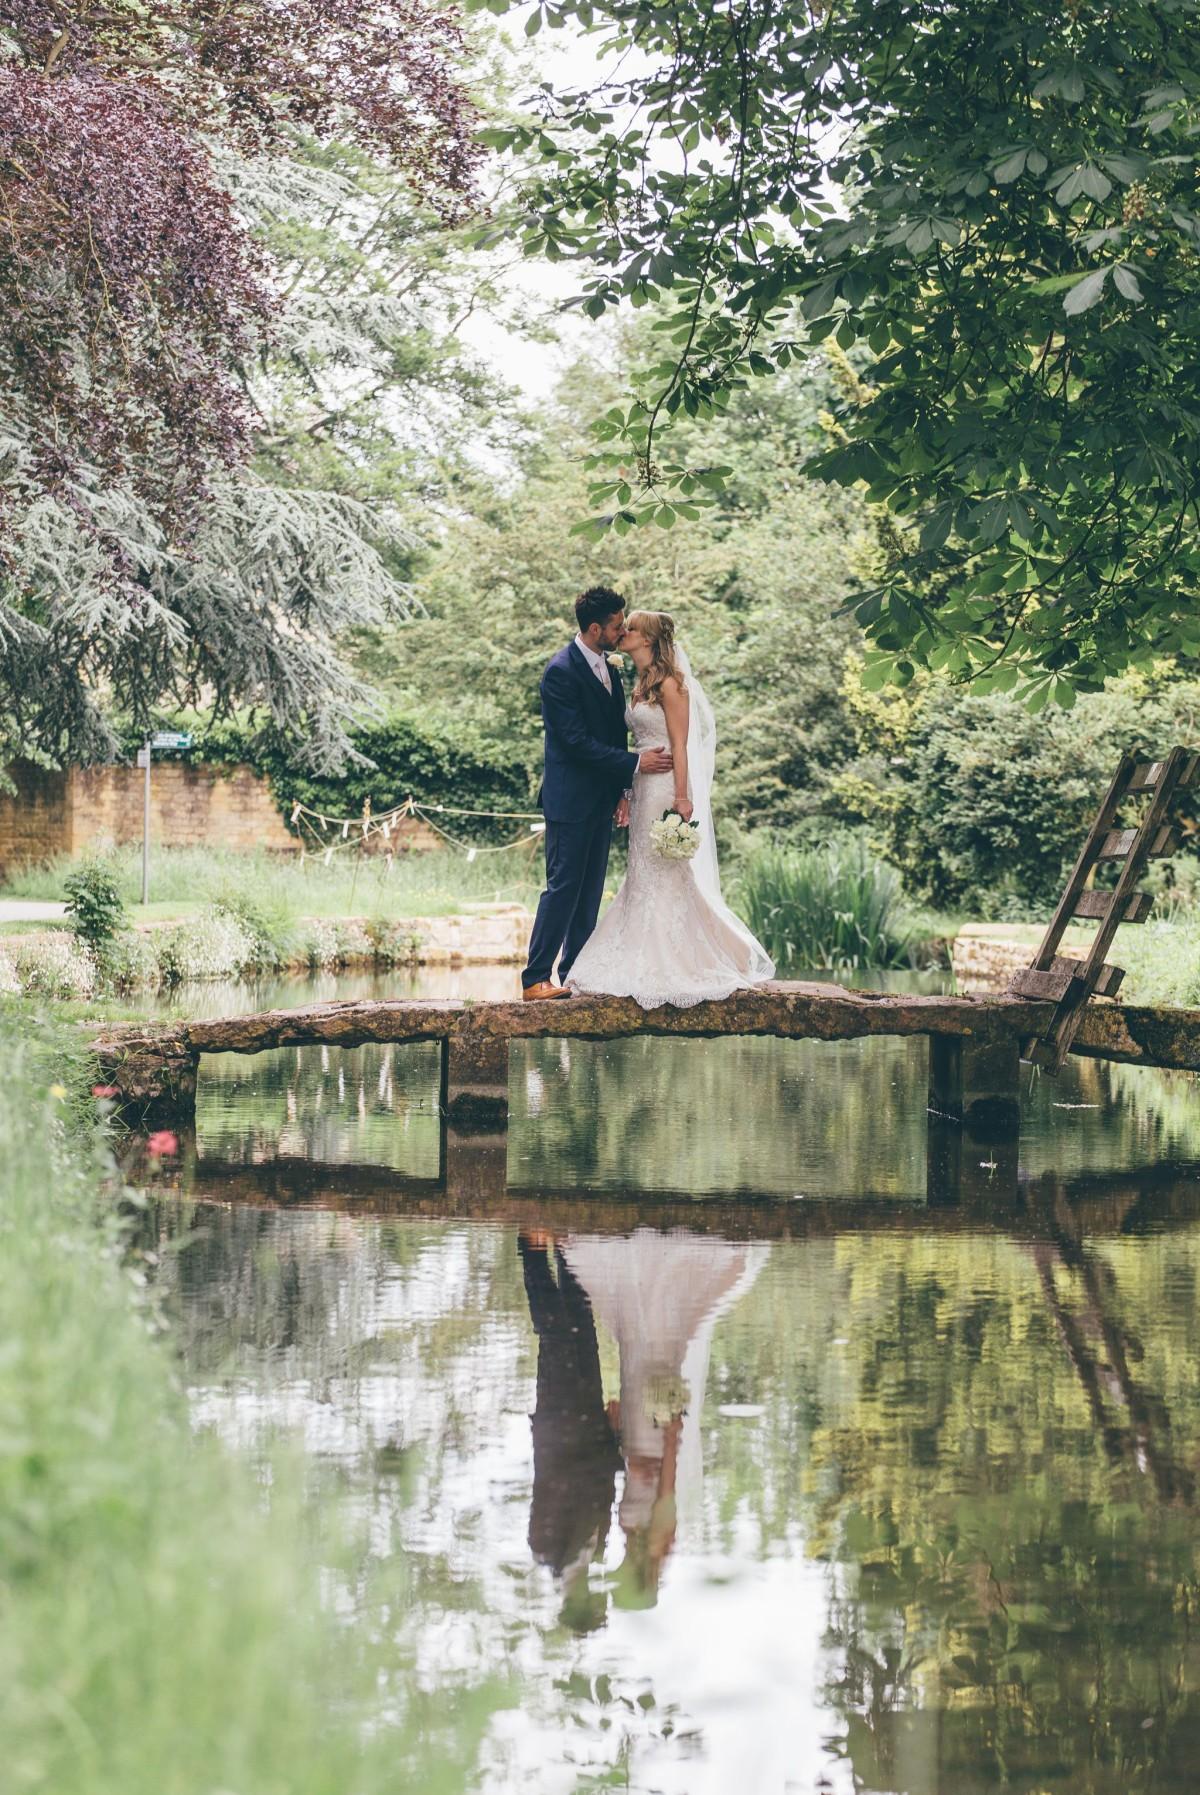 welsh_wedding_photographer_rachel_lambert_photography_lower_slaughter_manor_house_cotswolds_harriet_dean_ 61